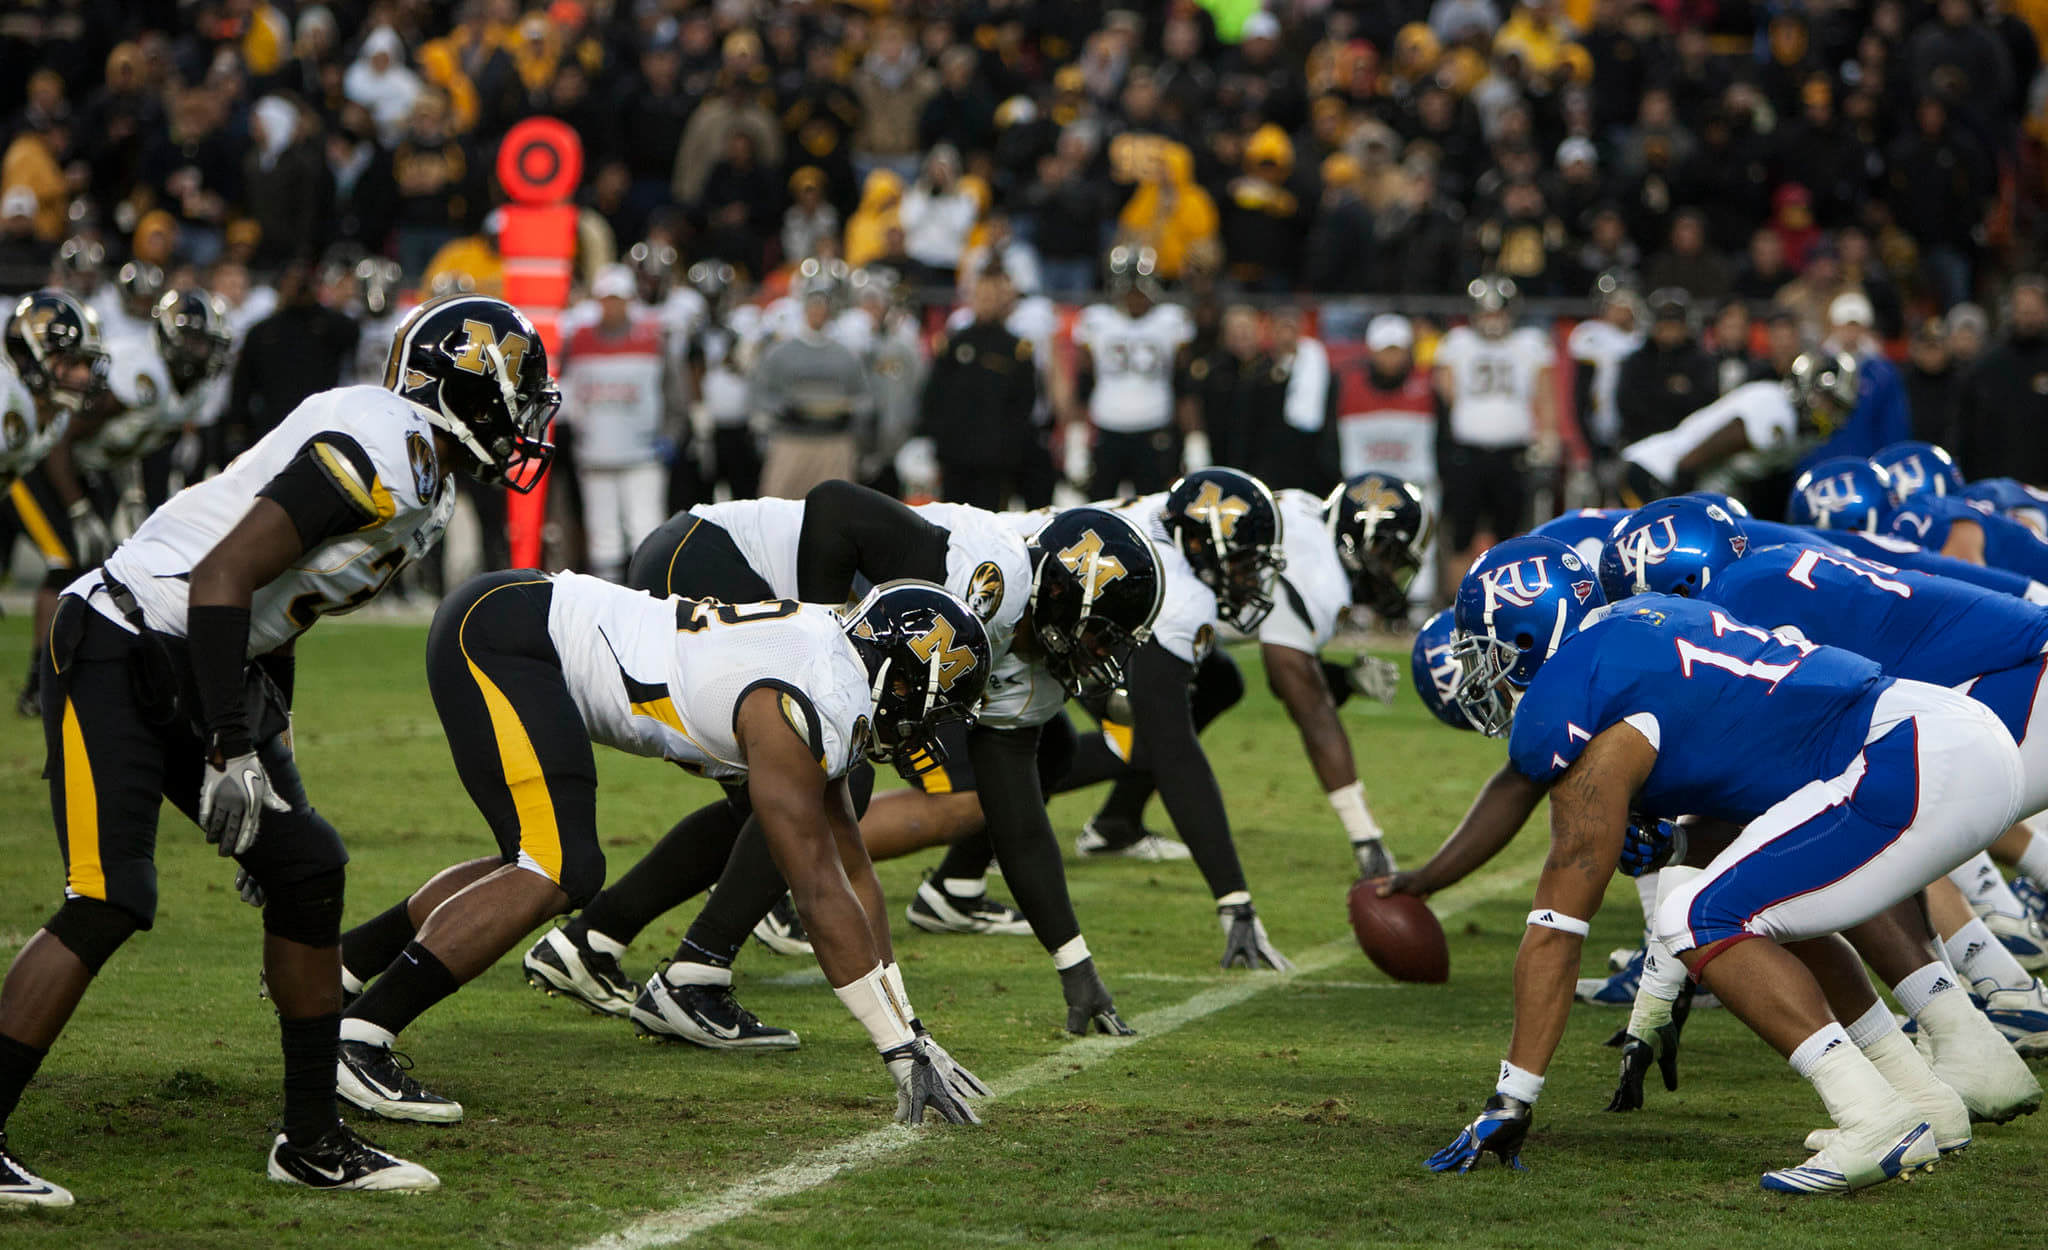 Missouri Tigers vs Kansas Jayhawks NCAAB football rivalry